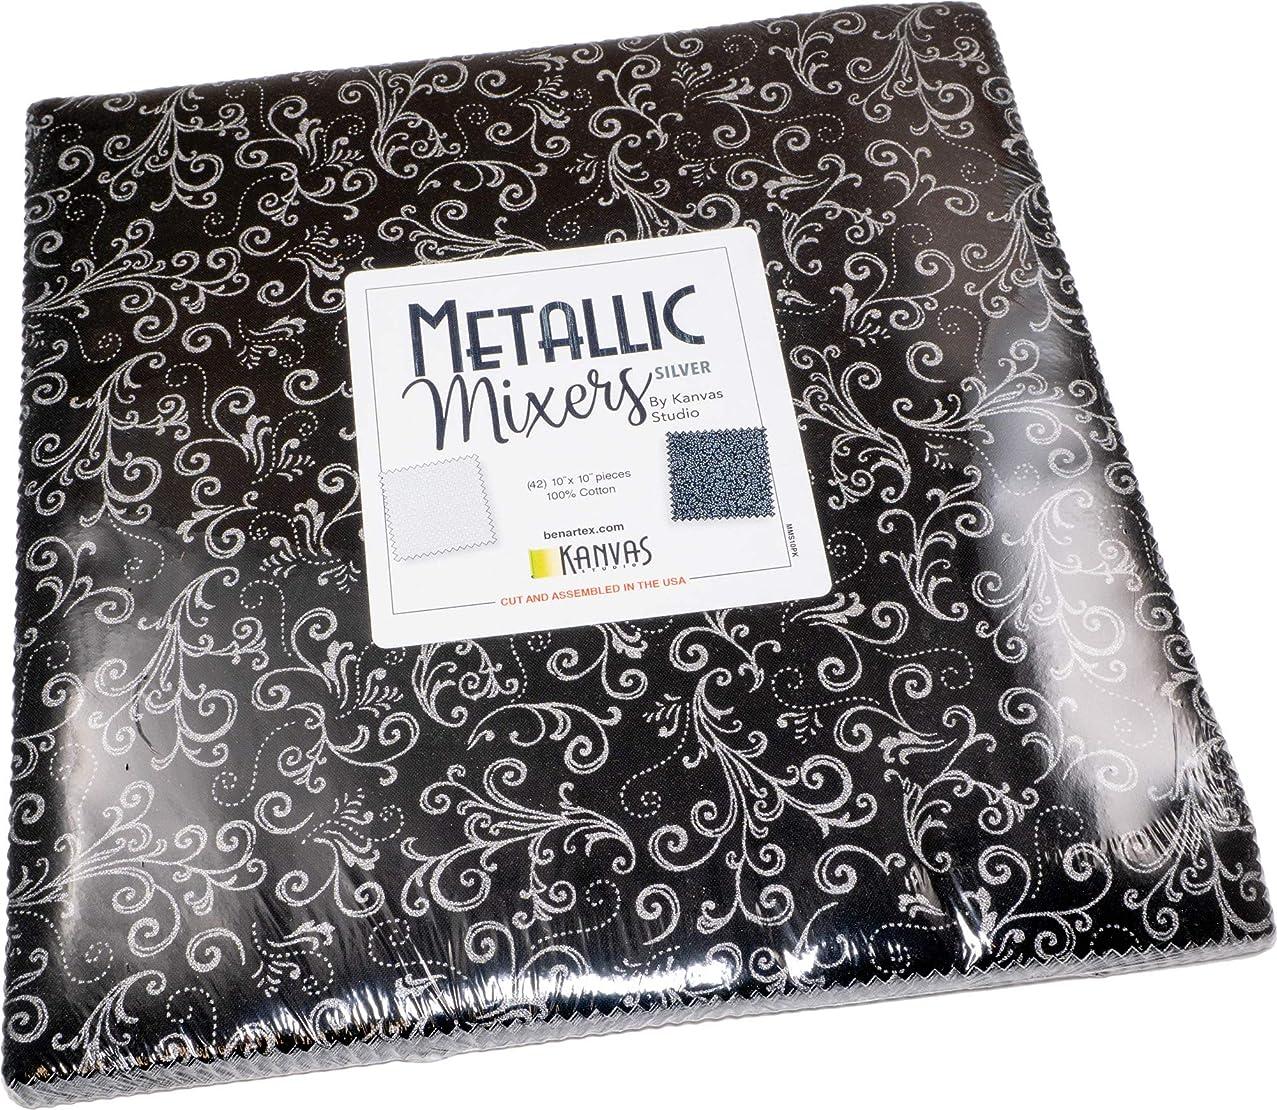 Kanvas Studio Metallic Mixers Silver 10X10 Pack 42 10-inch Squares Layer Cake Benartex